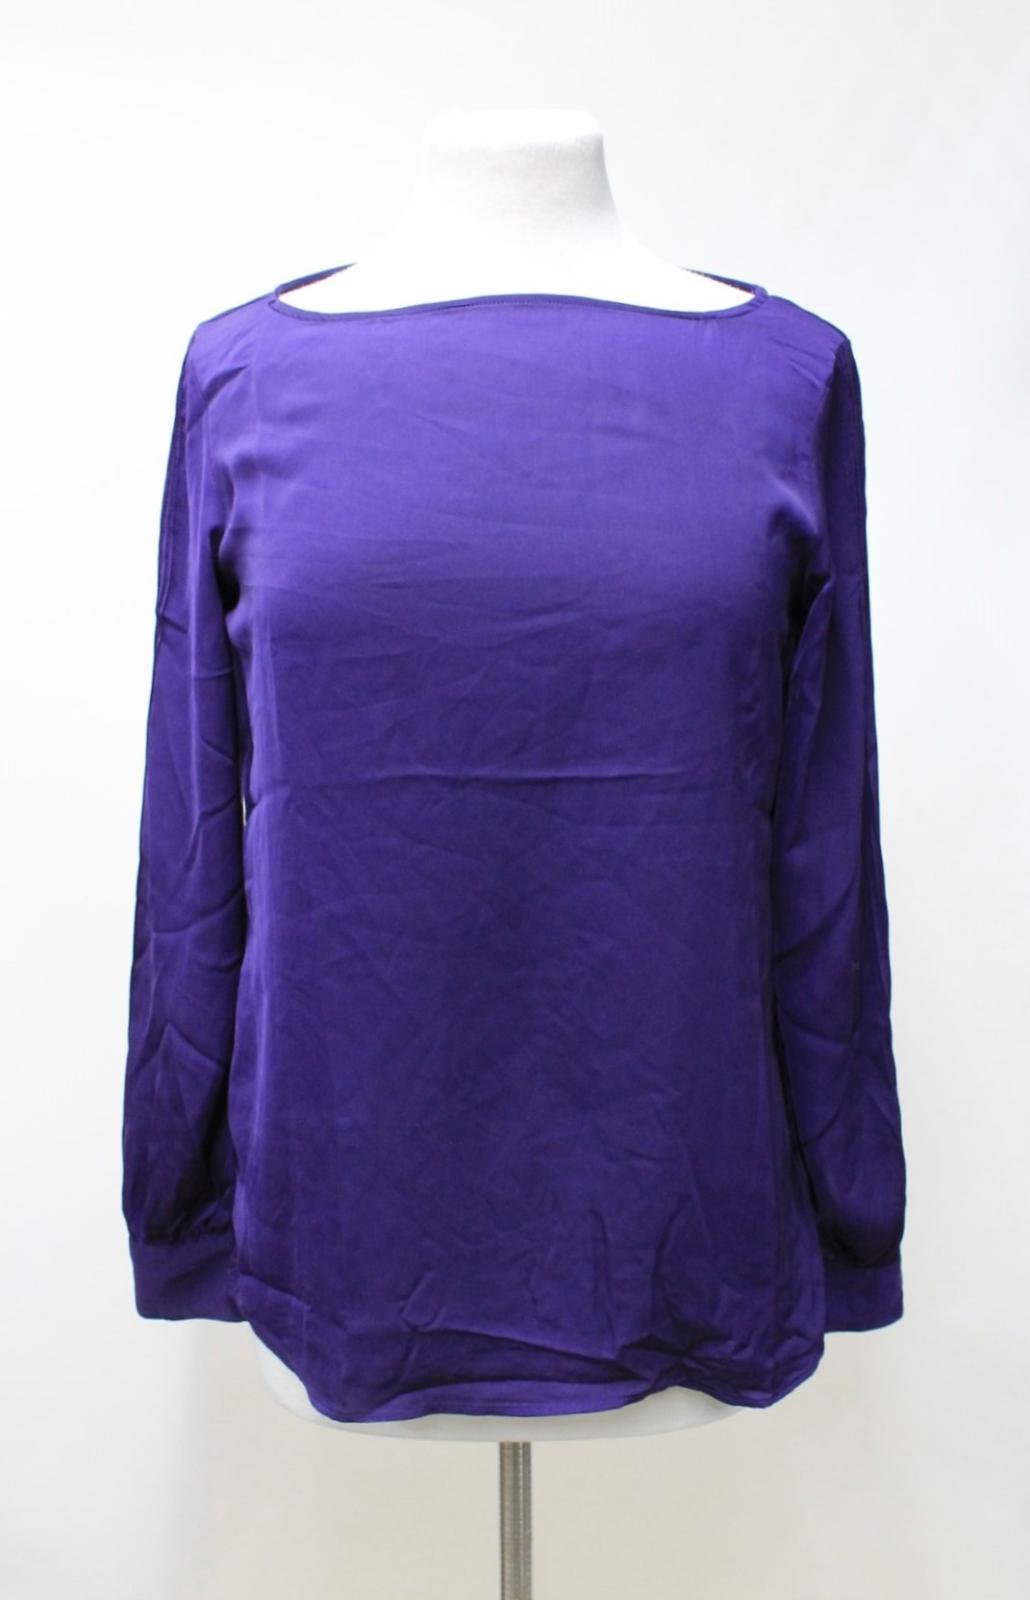 LAUREN-BY-RALPH-LAUREN-Ladies-Purple-Satin-Pleated-Sleeve-Round-Neck-Top-S thumbnail 12